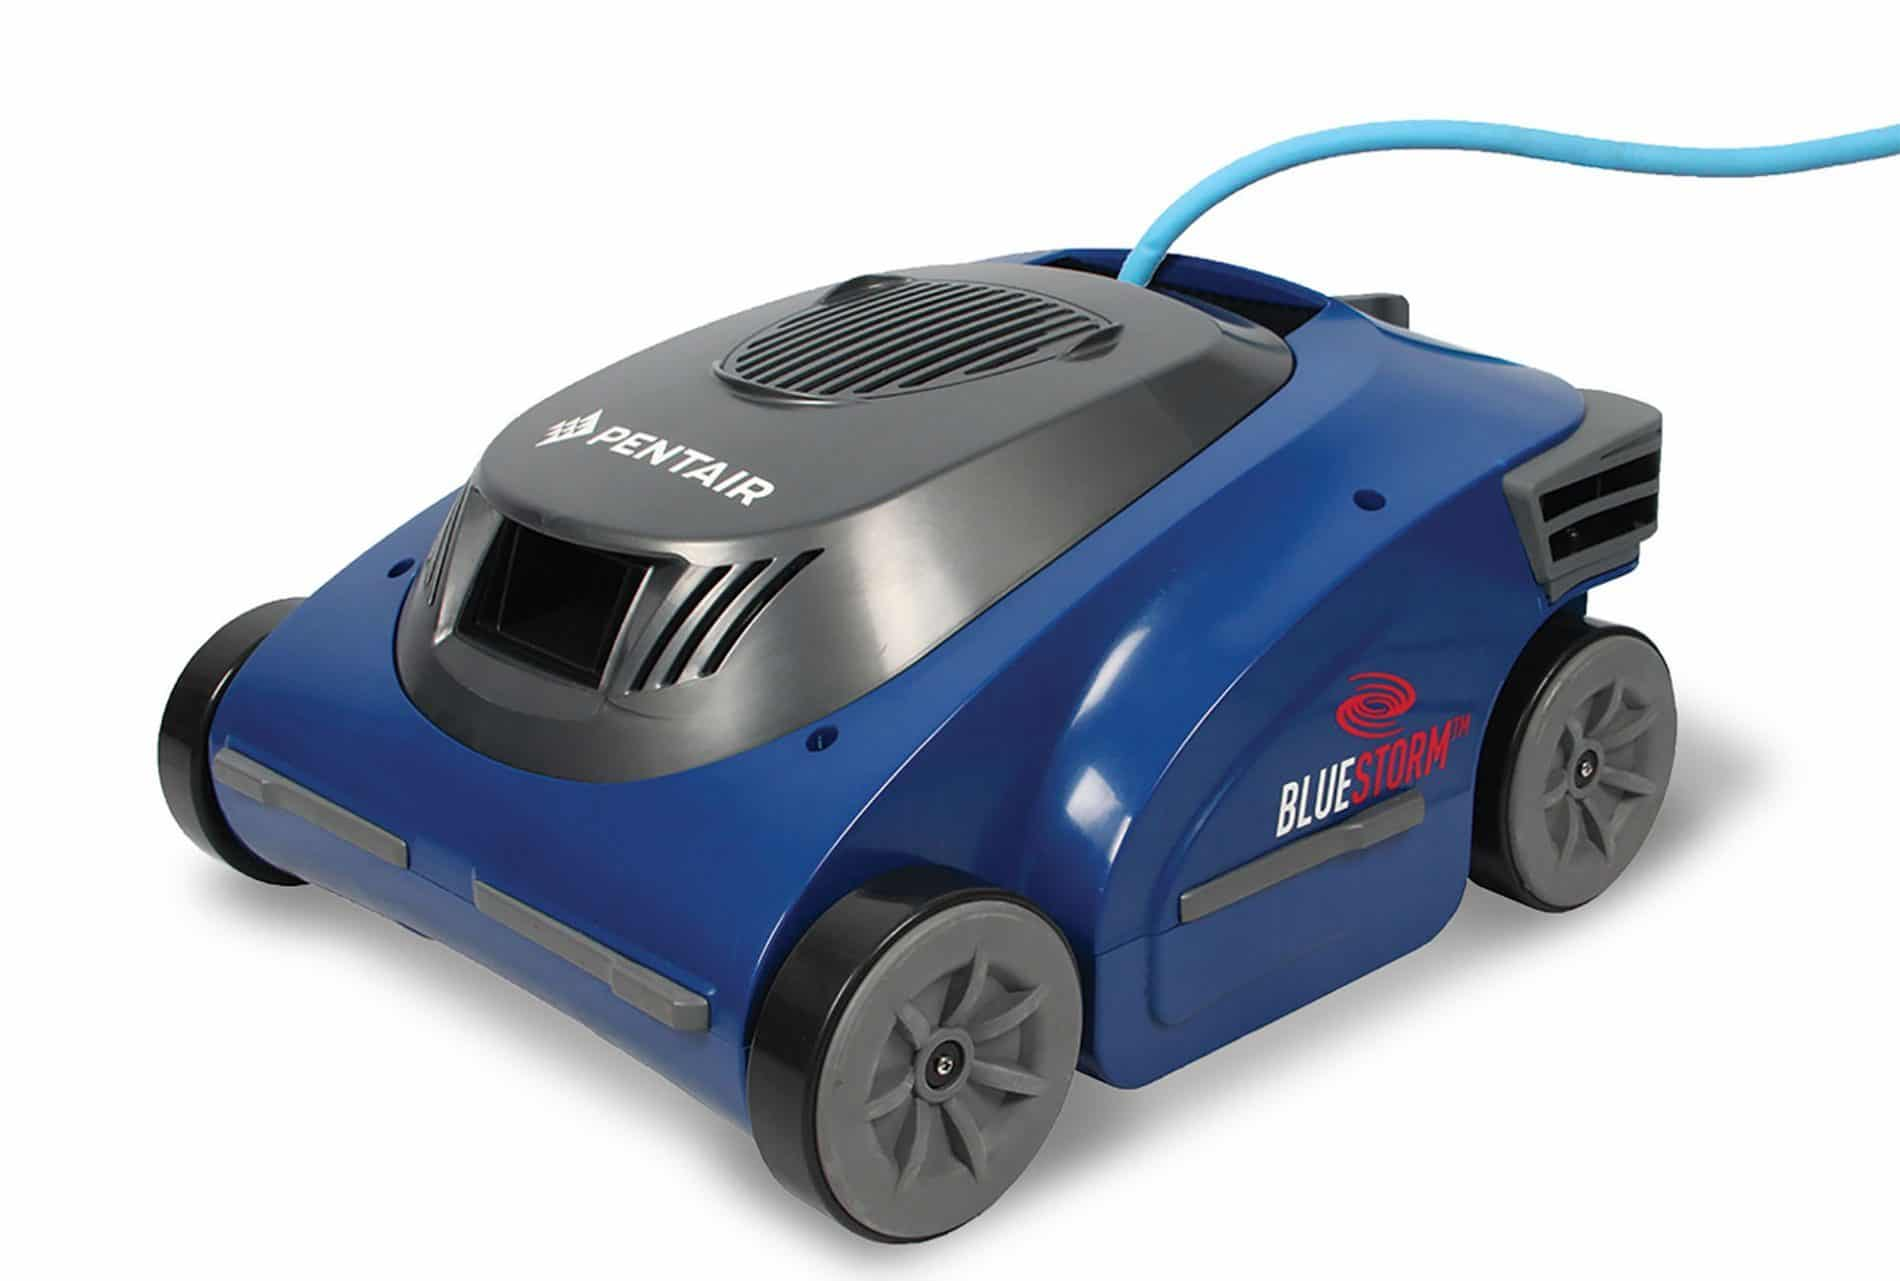 Robot BlueStorm